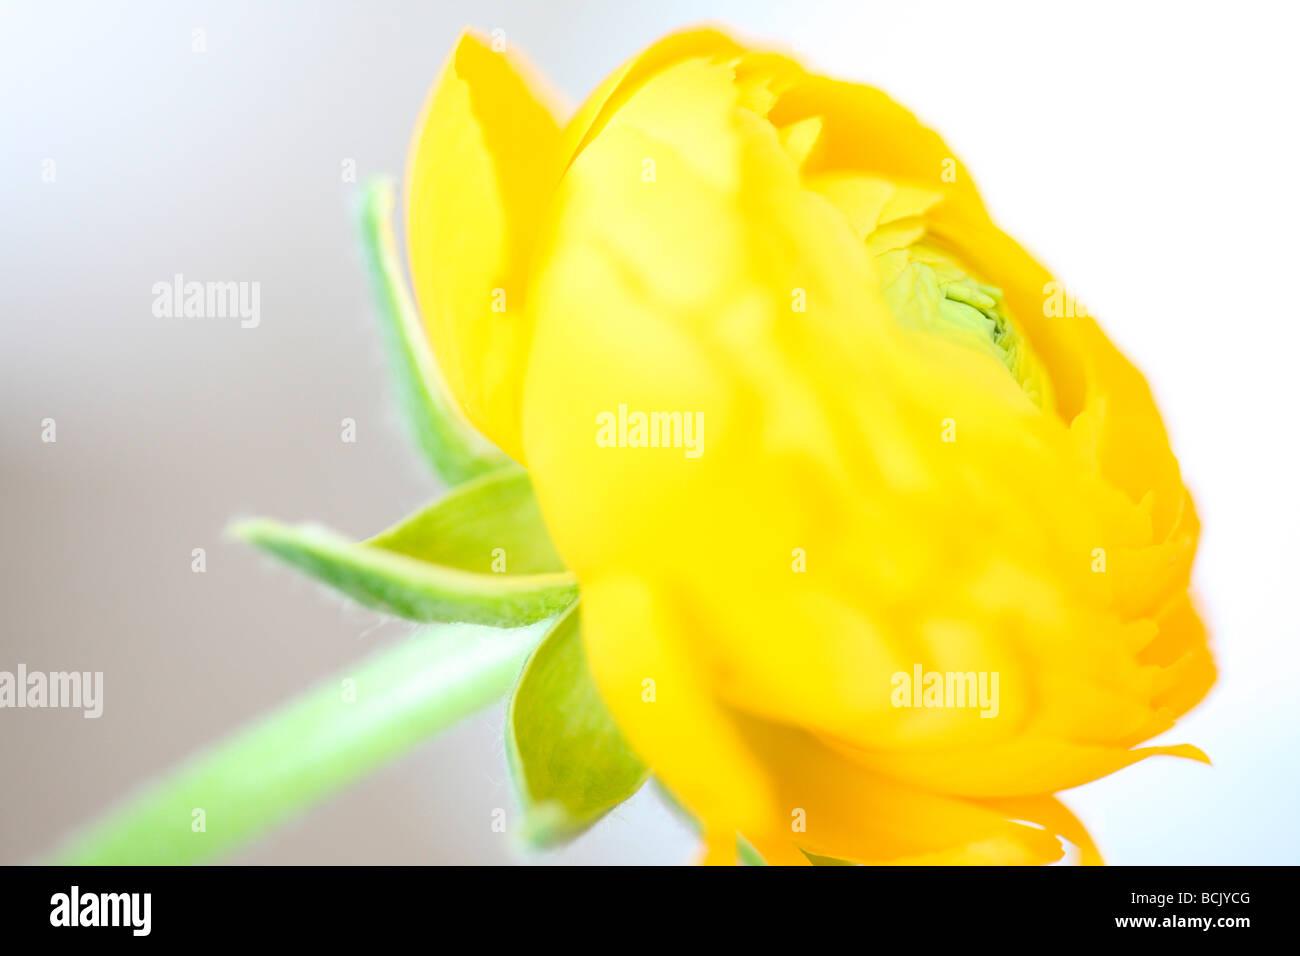 Bella ranunculus sensibile e radiante arte fotografia Jane Ann Butler JABP Fotografia388 Immagini Stock